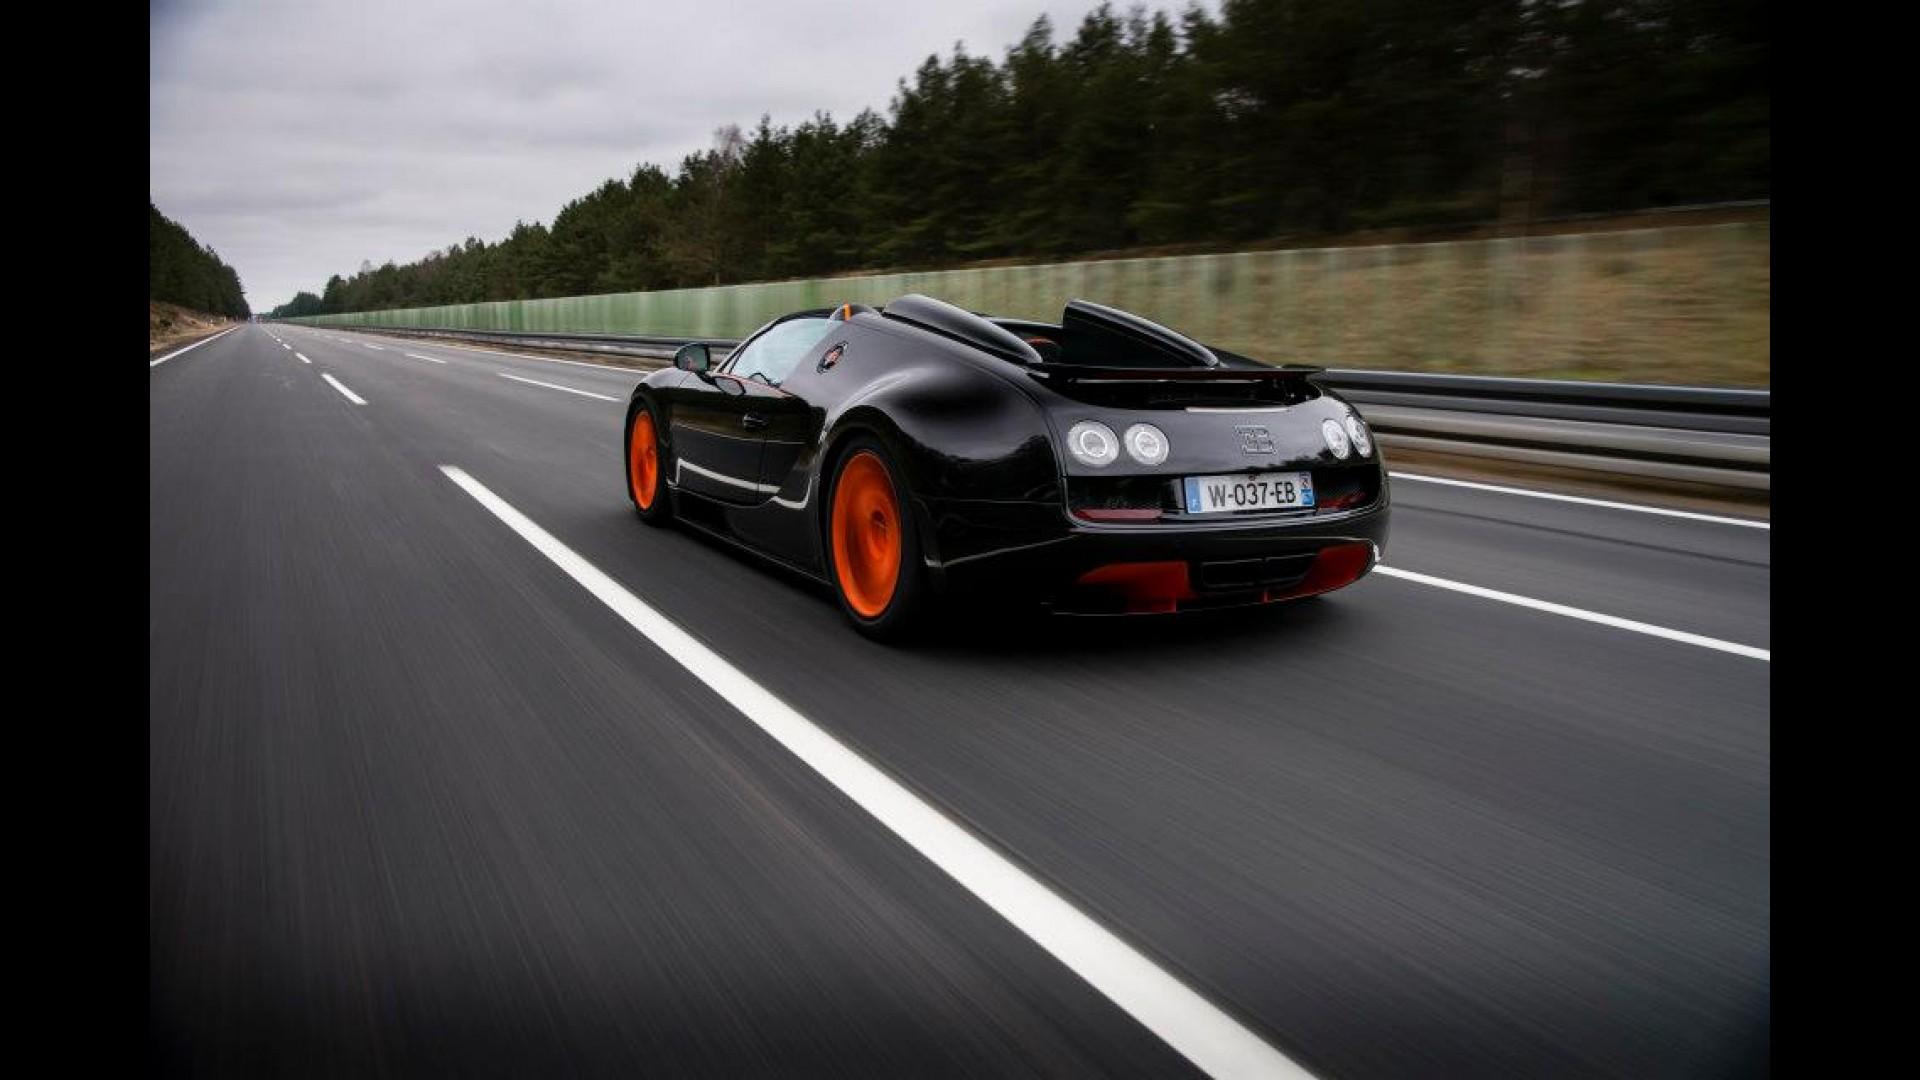 bugatti-veyron-16-4-grand-sport-vitesse-world-record-car Fabulous 2012 Bugatti Veyron Grand Sport Vitesse Specs Cars Trend